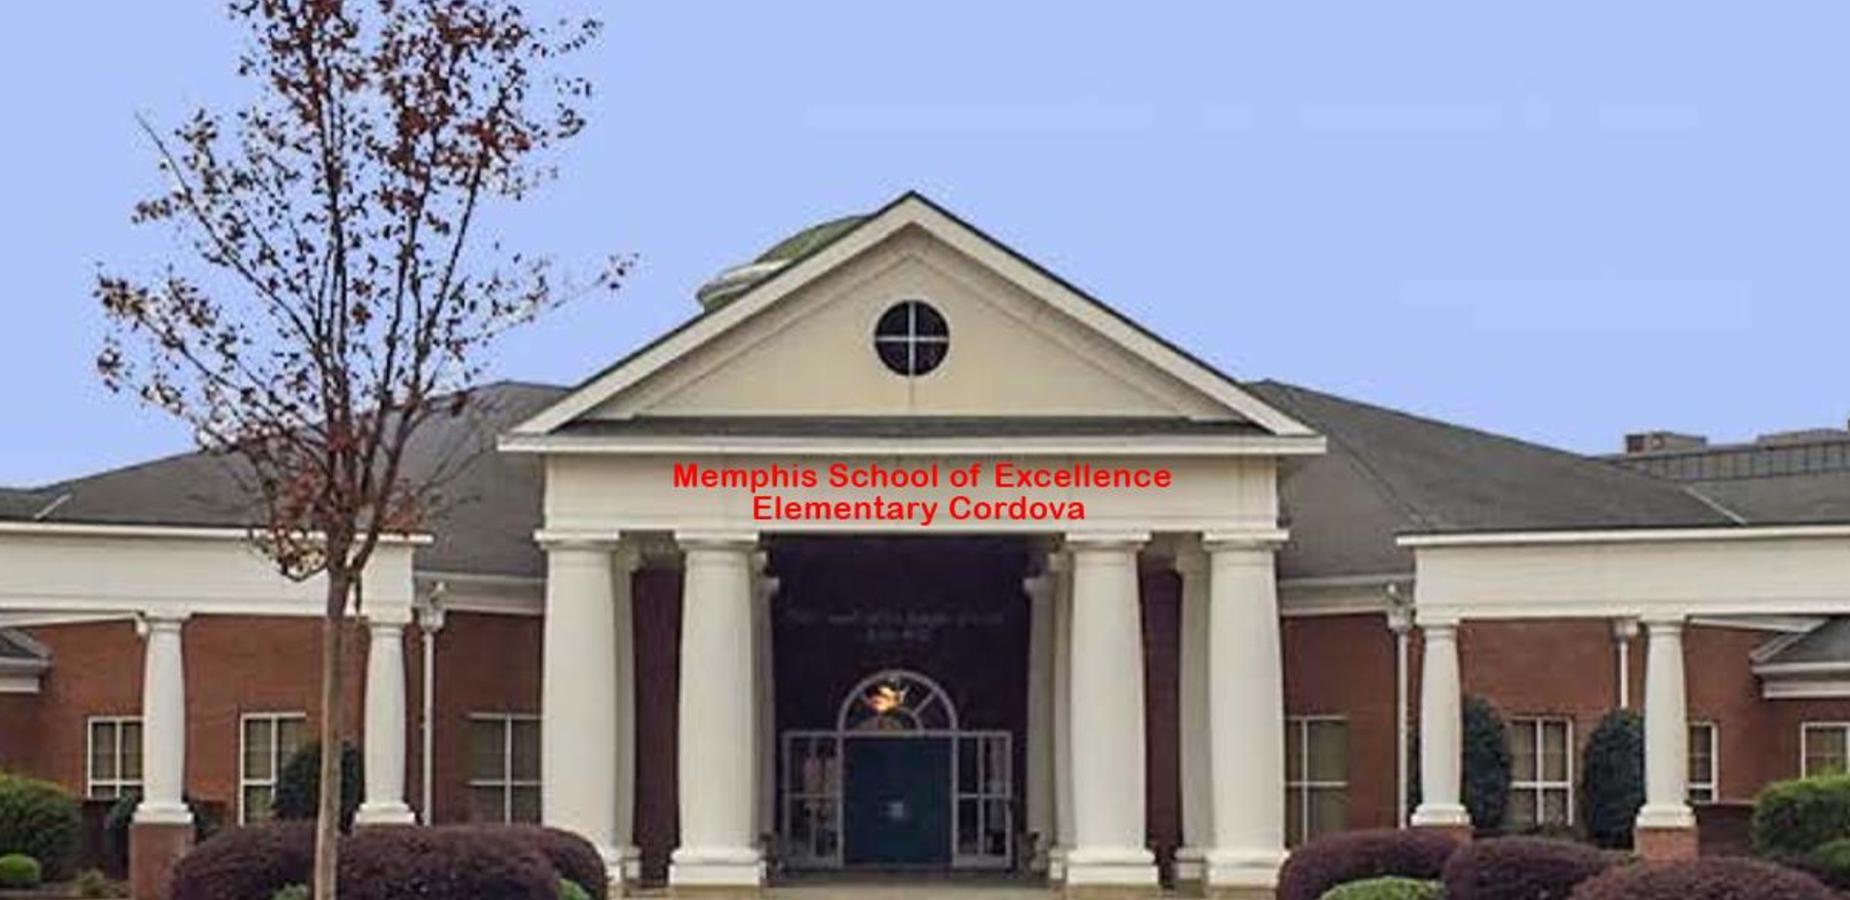 Memphis School of Excellence Elementary Cordova